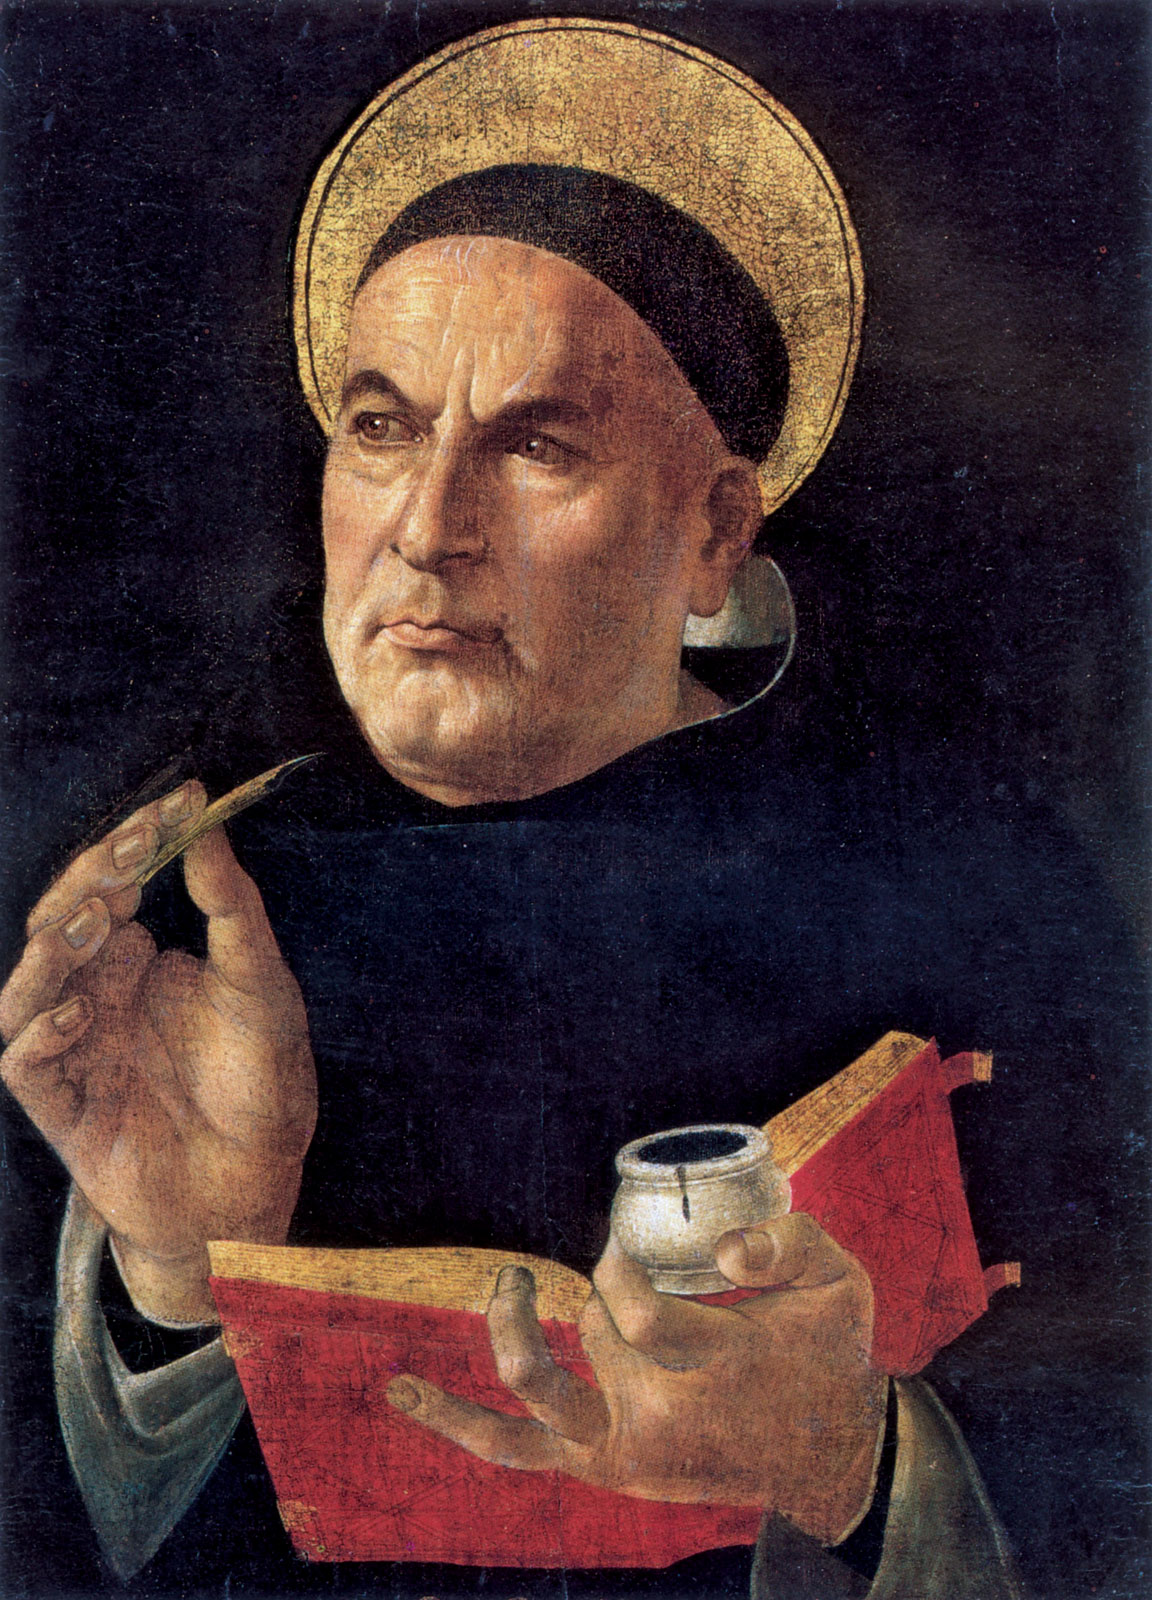 Santo Tomás de Aquino: Patrono da Ordem